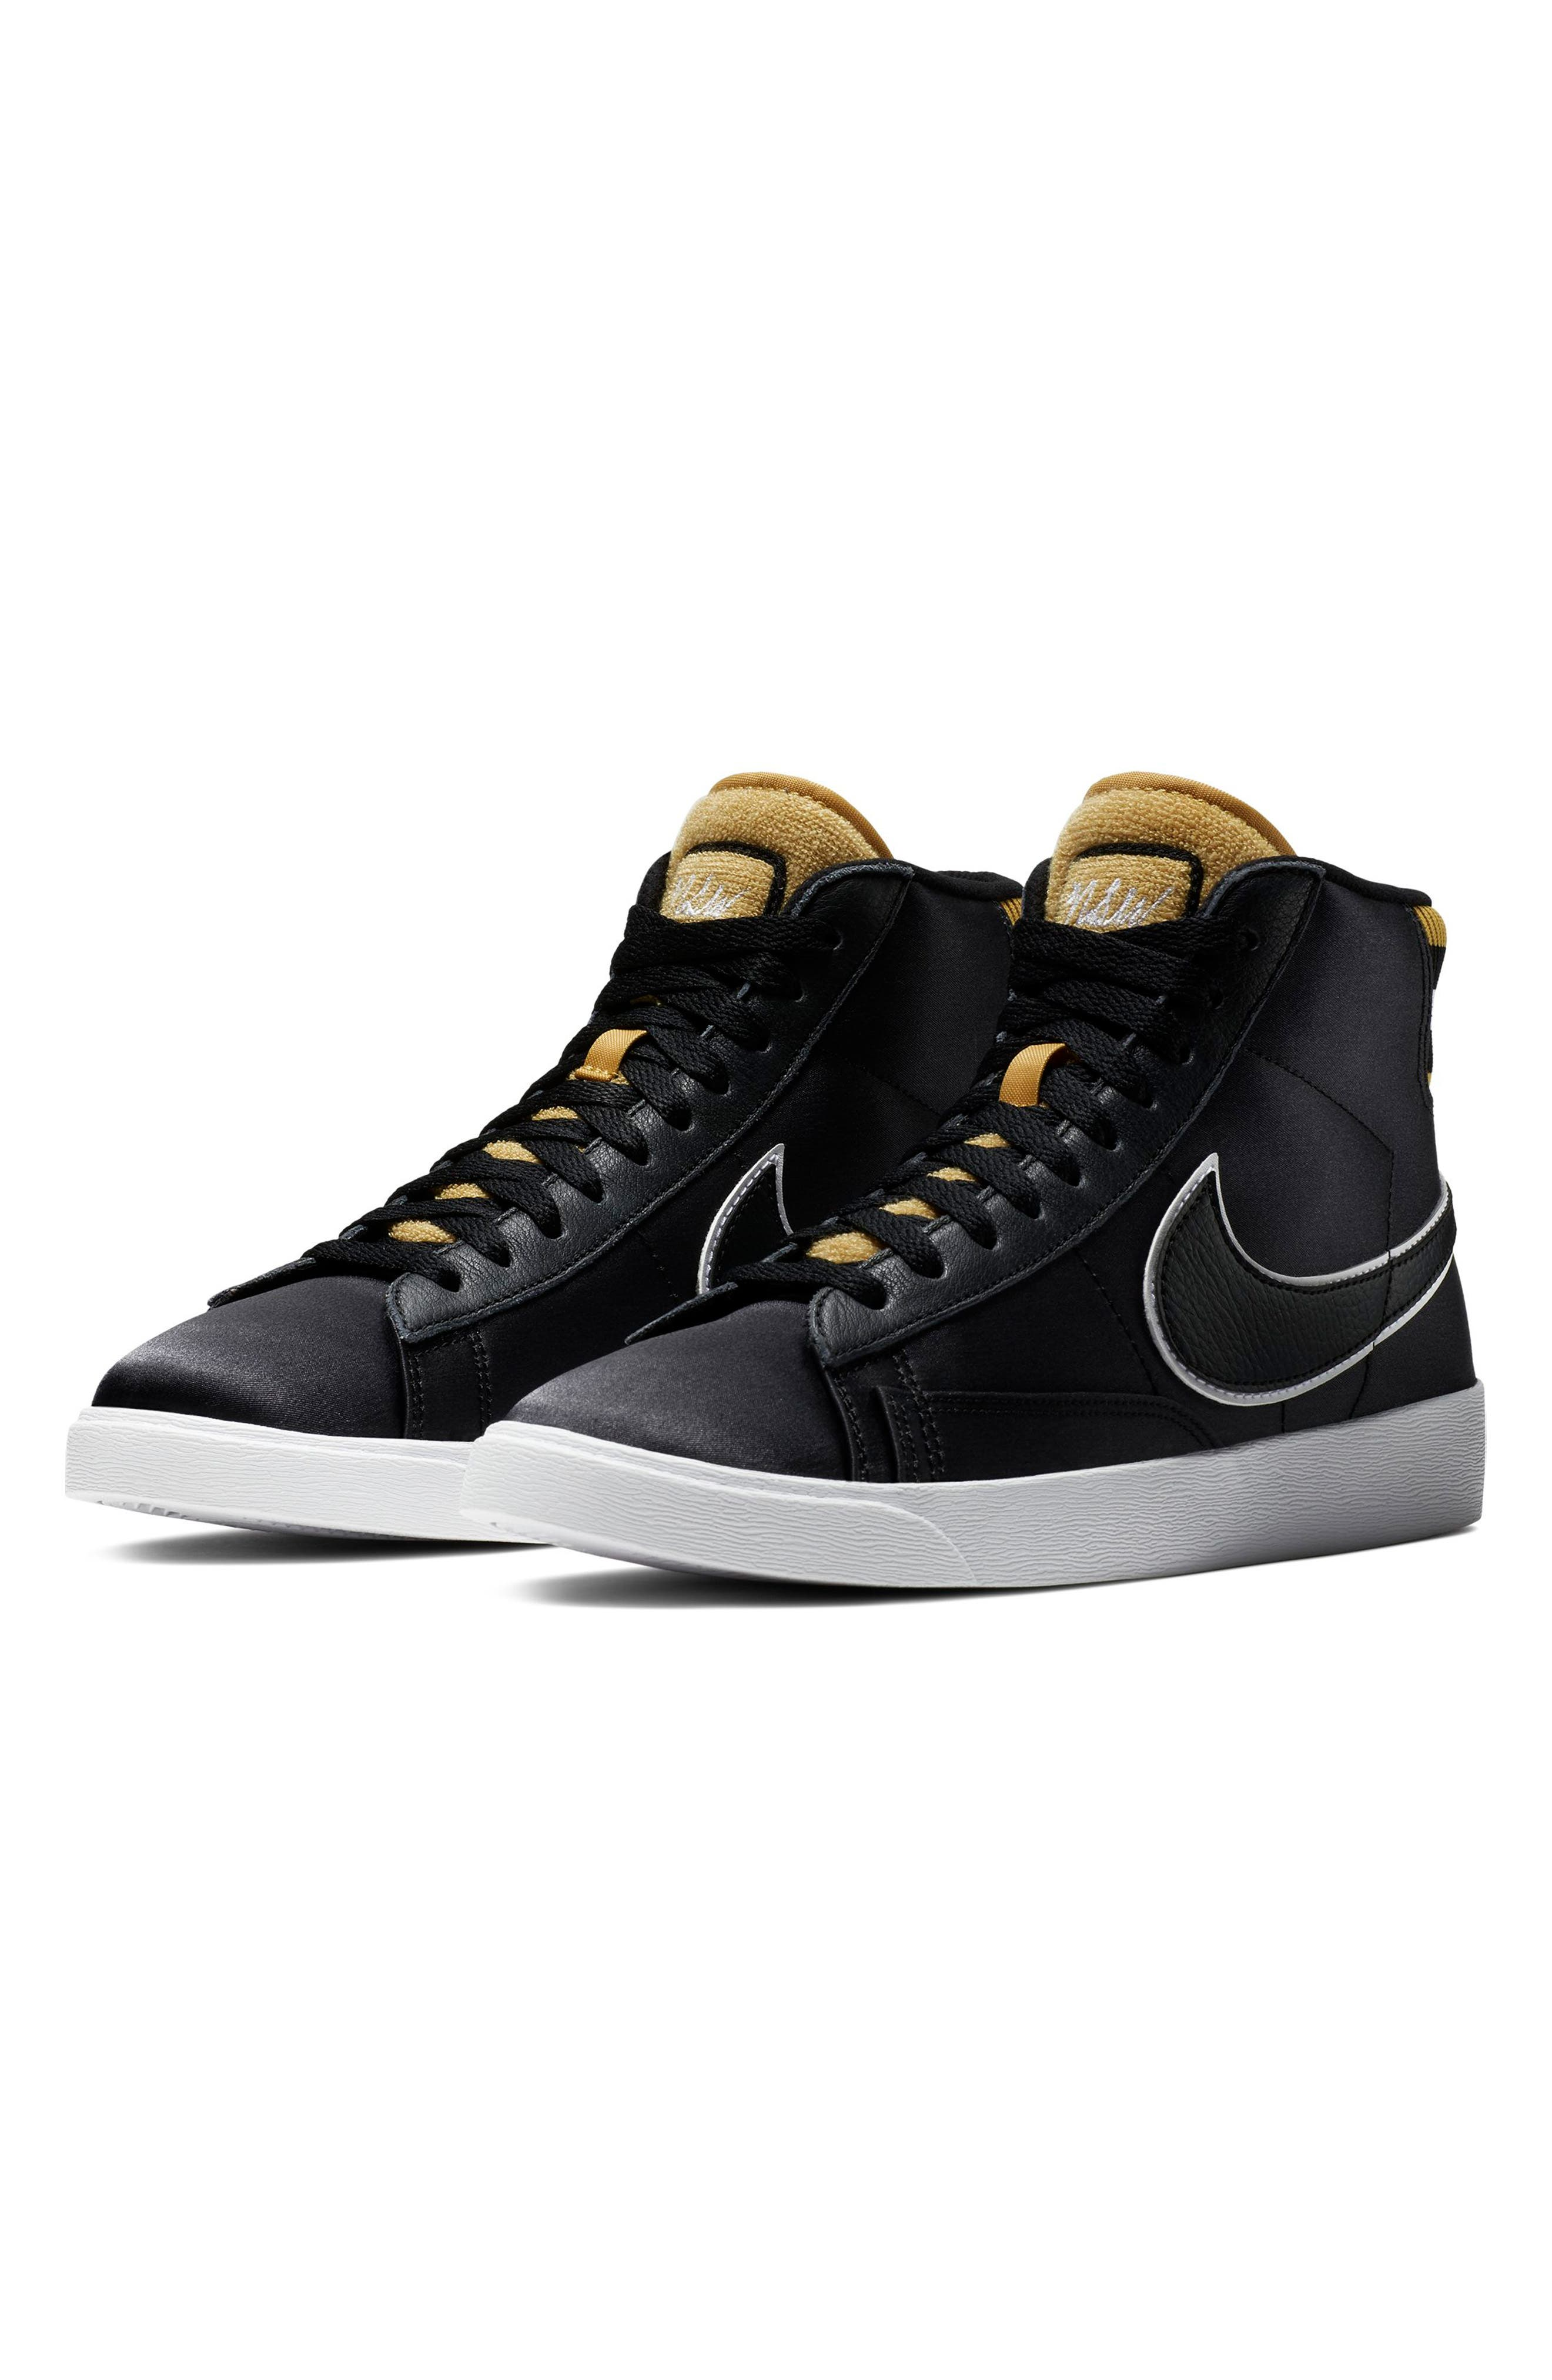 Blazer Mid Top Sneaker,                             Main thumbnail 1, color,                             BLACK/ BLACK